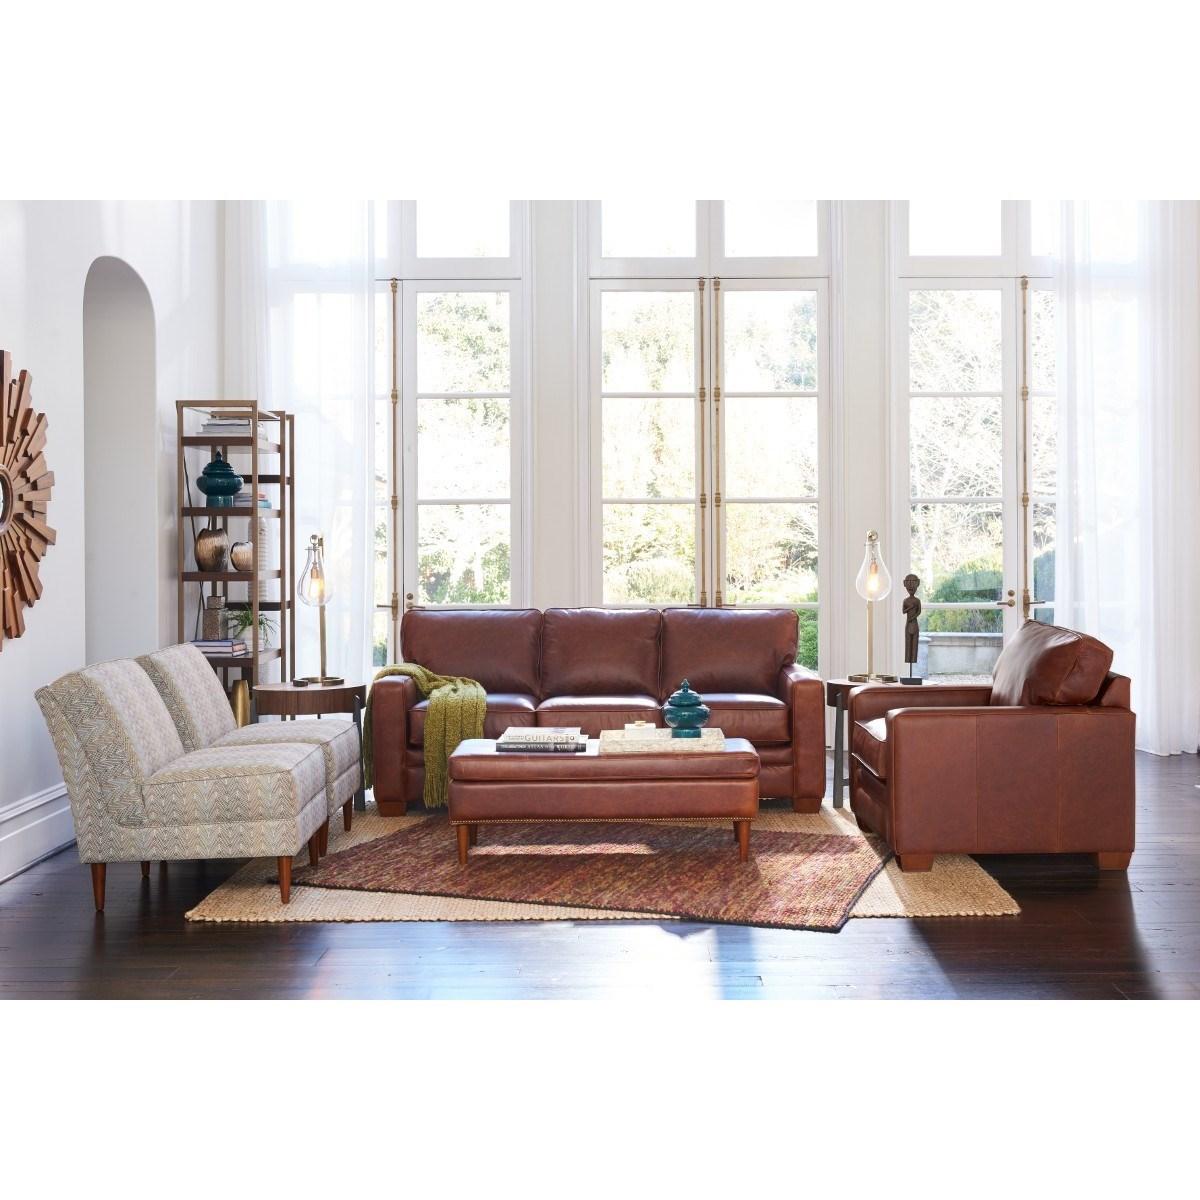 lazy boy living room wooden furniture sofas la z meyer group reid s stationary